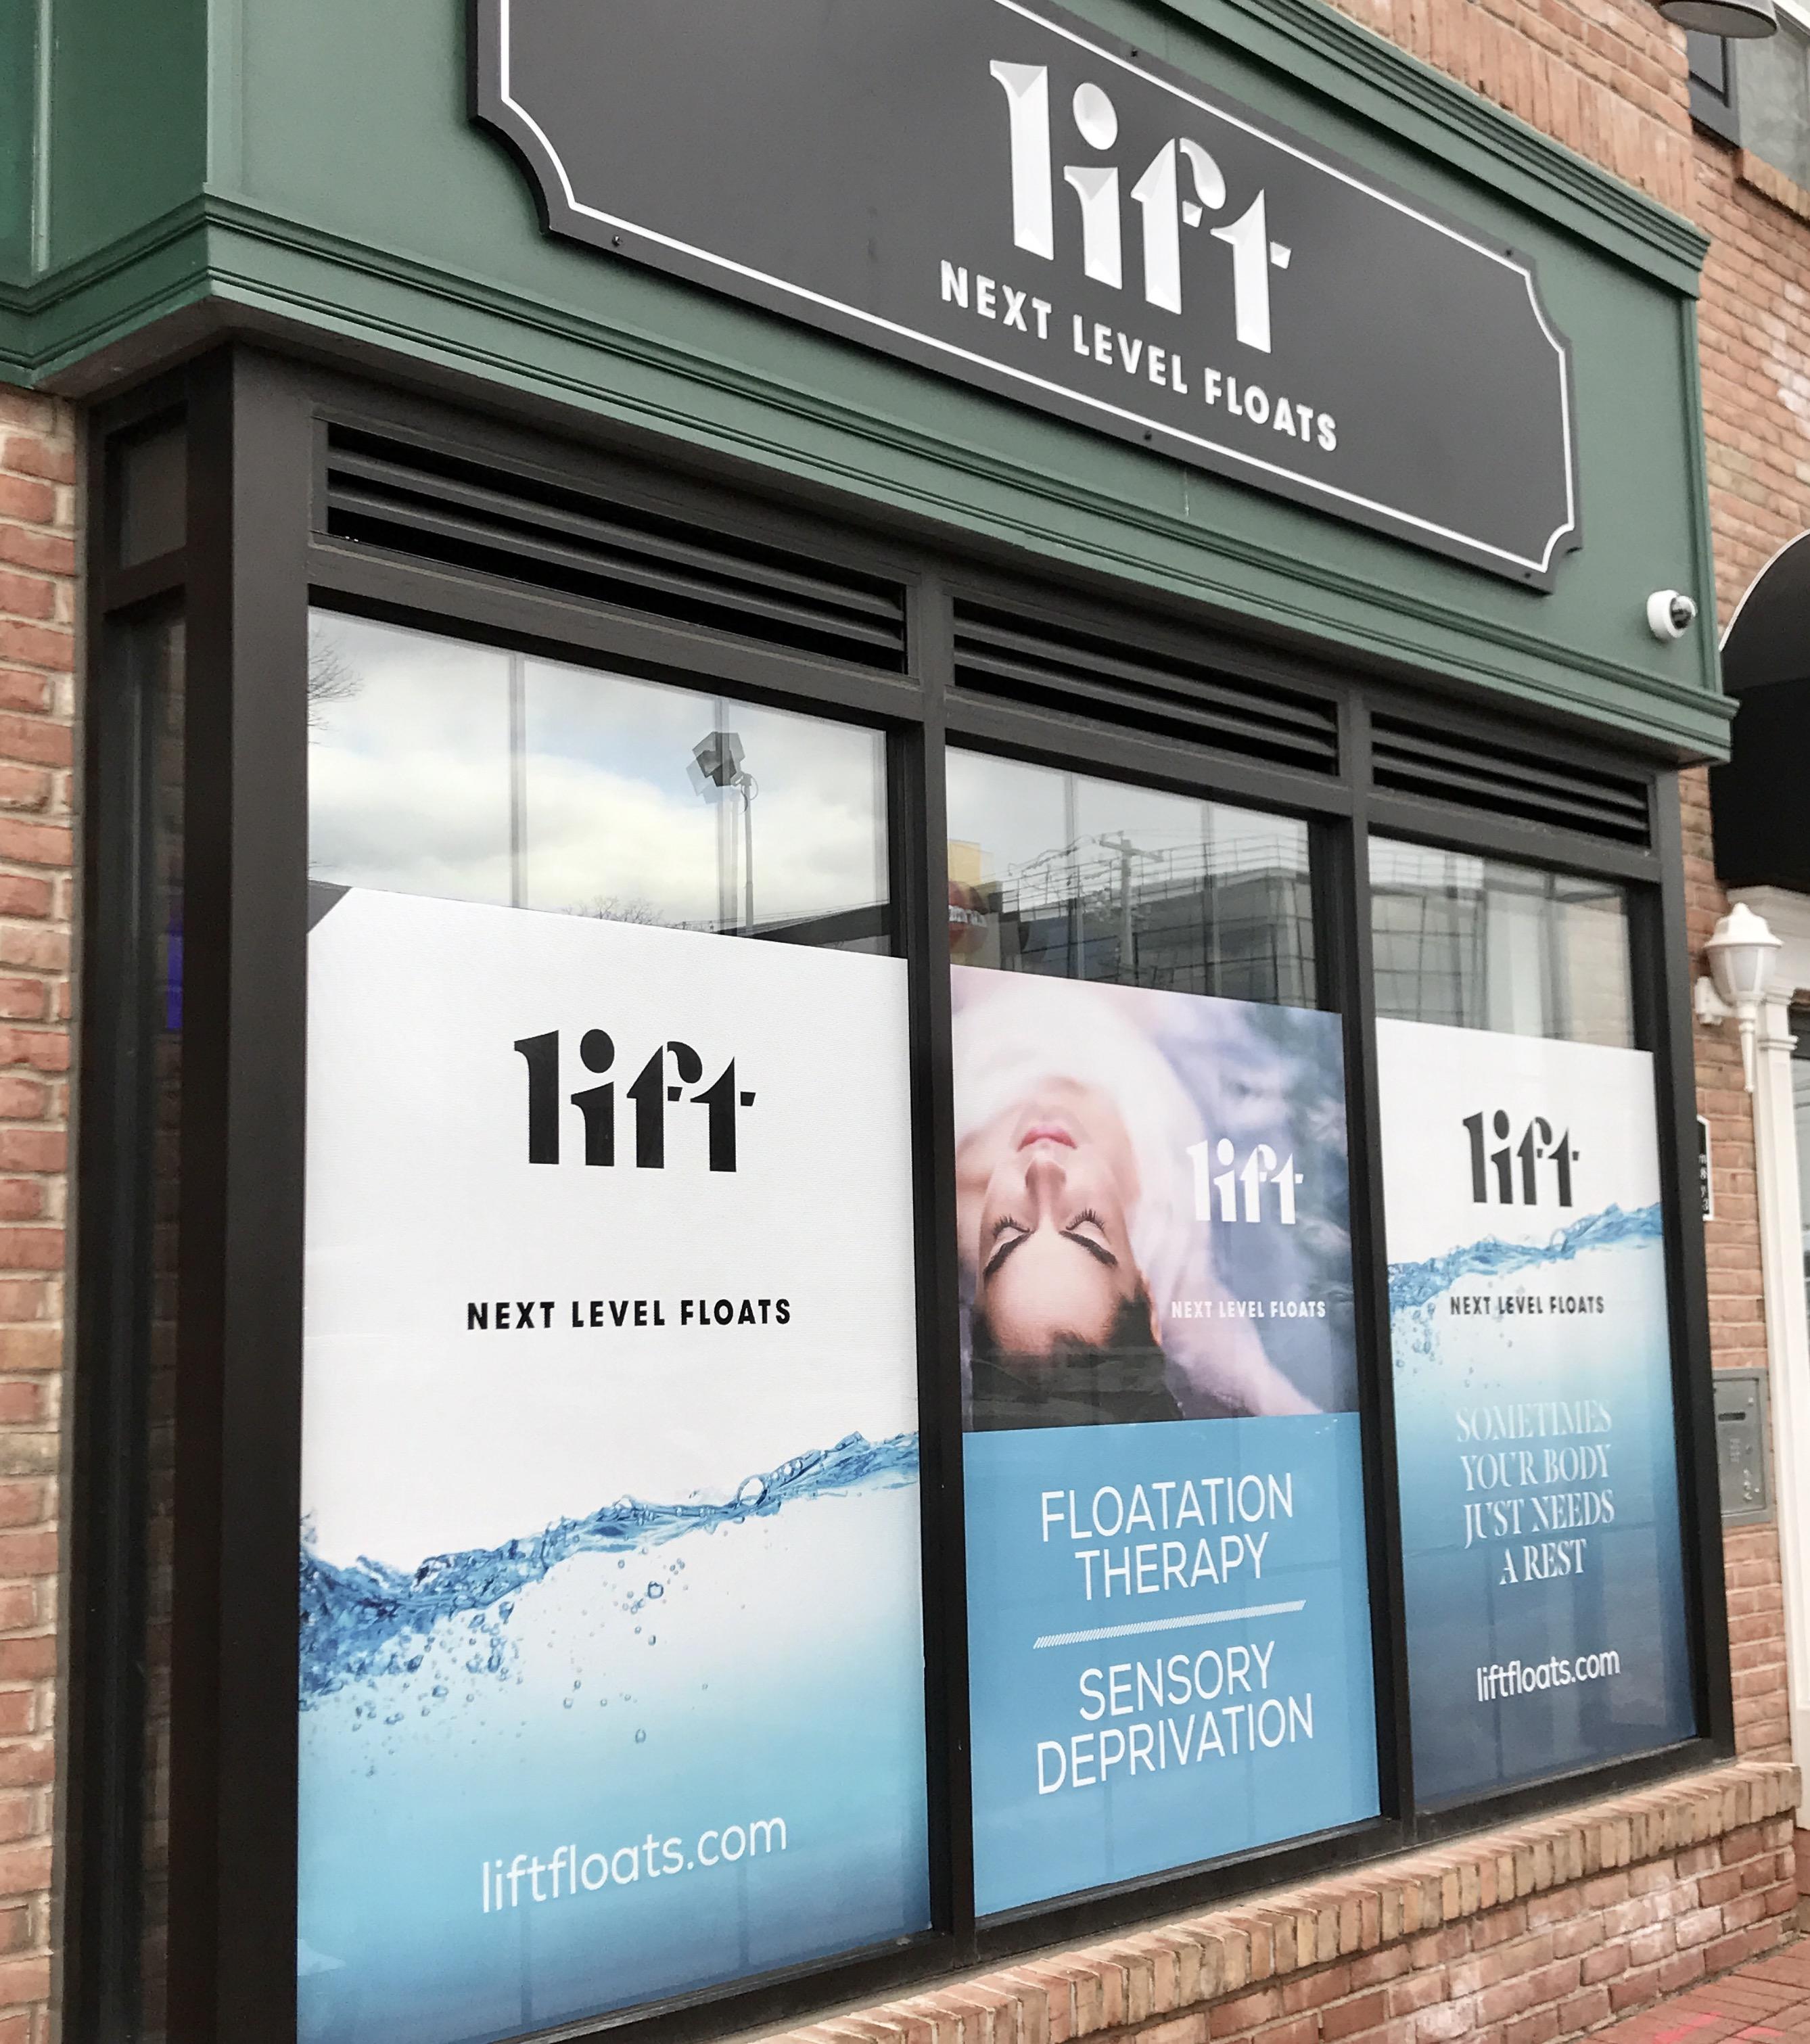 Lift / Next Level Floats (Huntington)